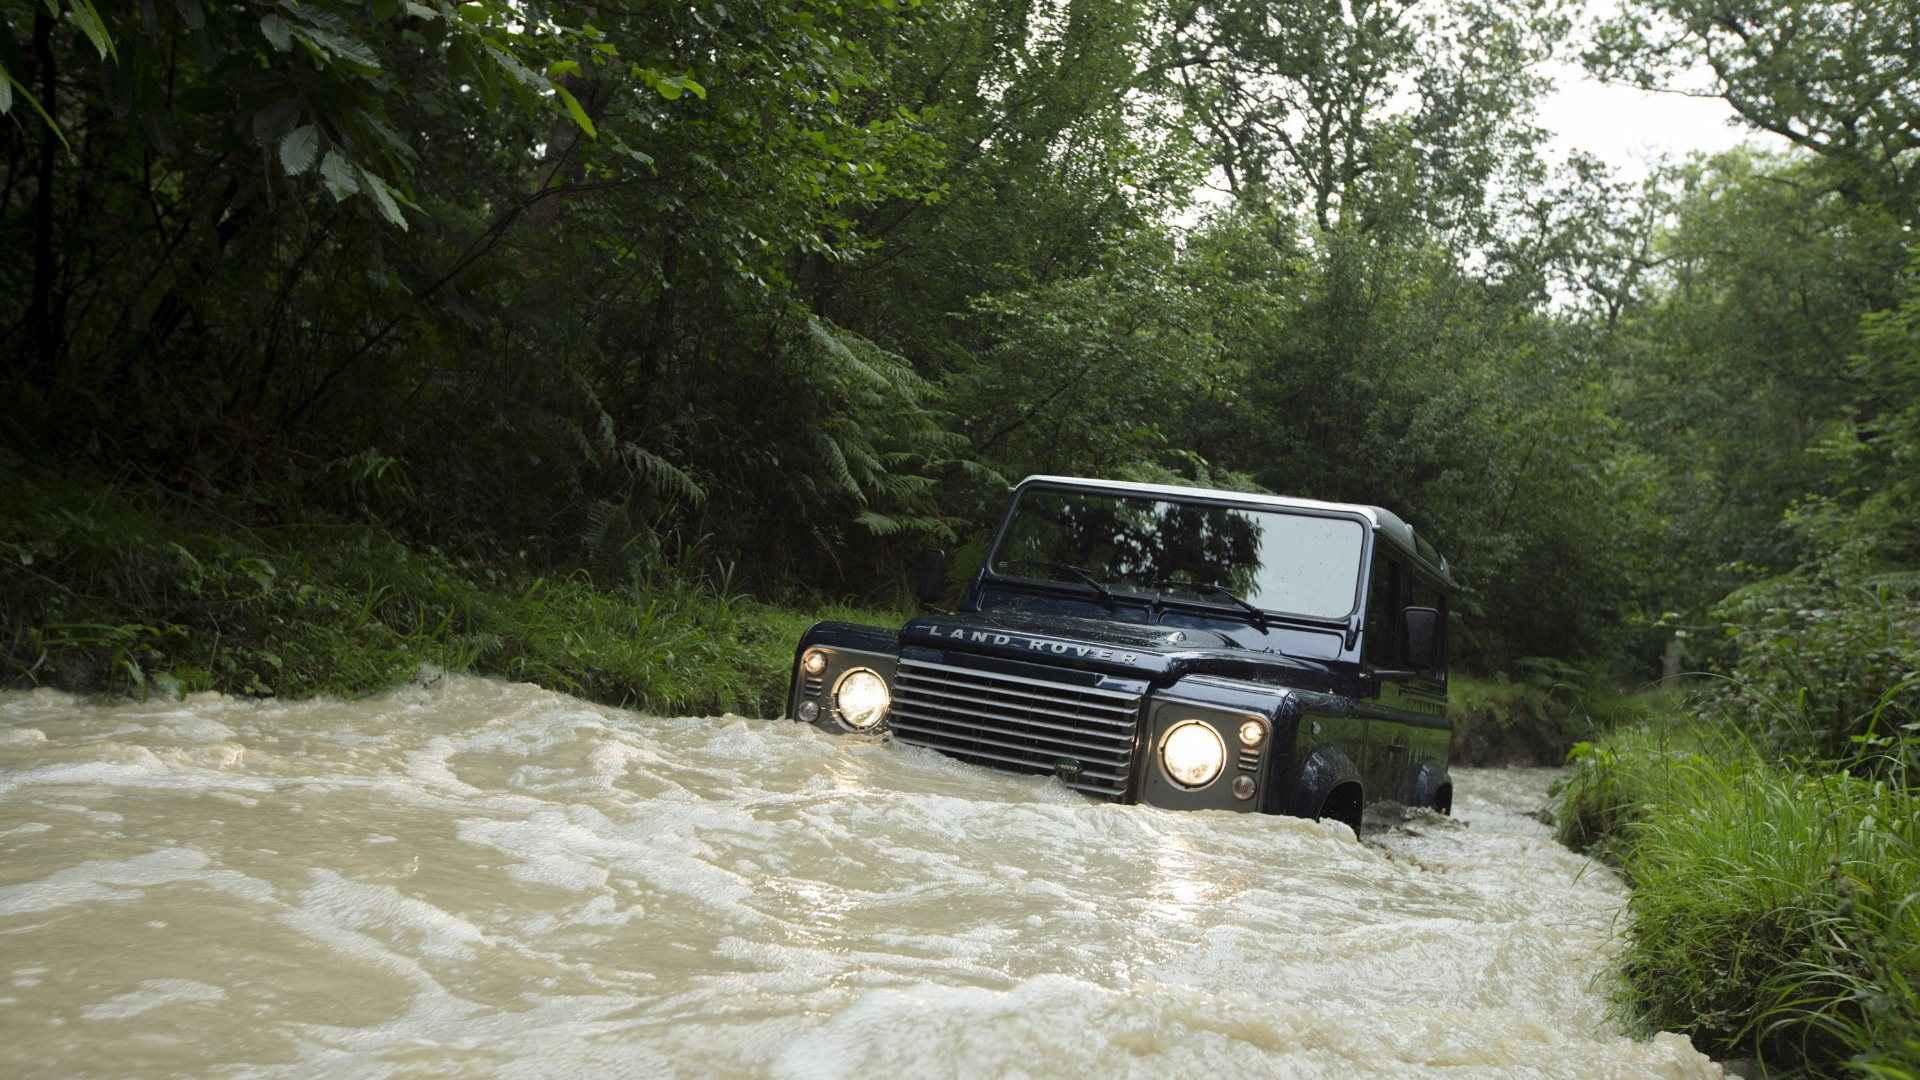 Wallpaper Land Rover Defender Off Road Wallpapers